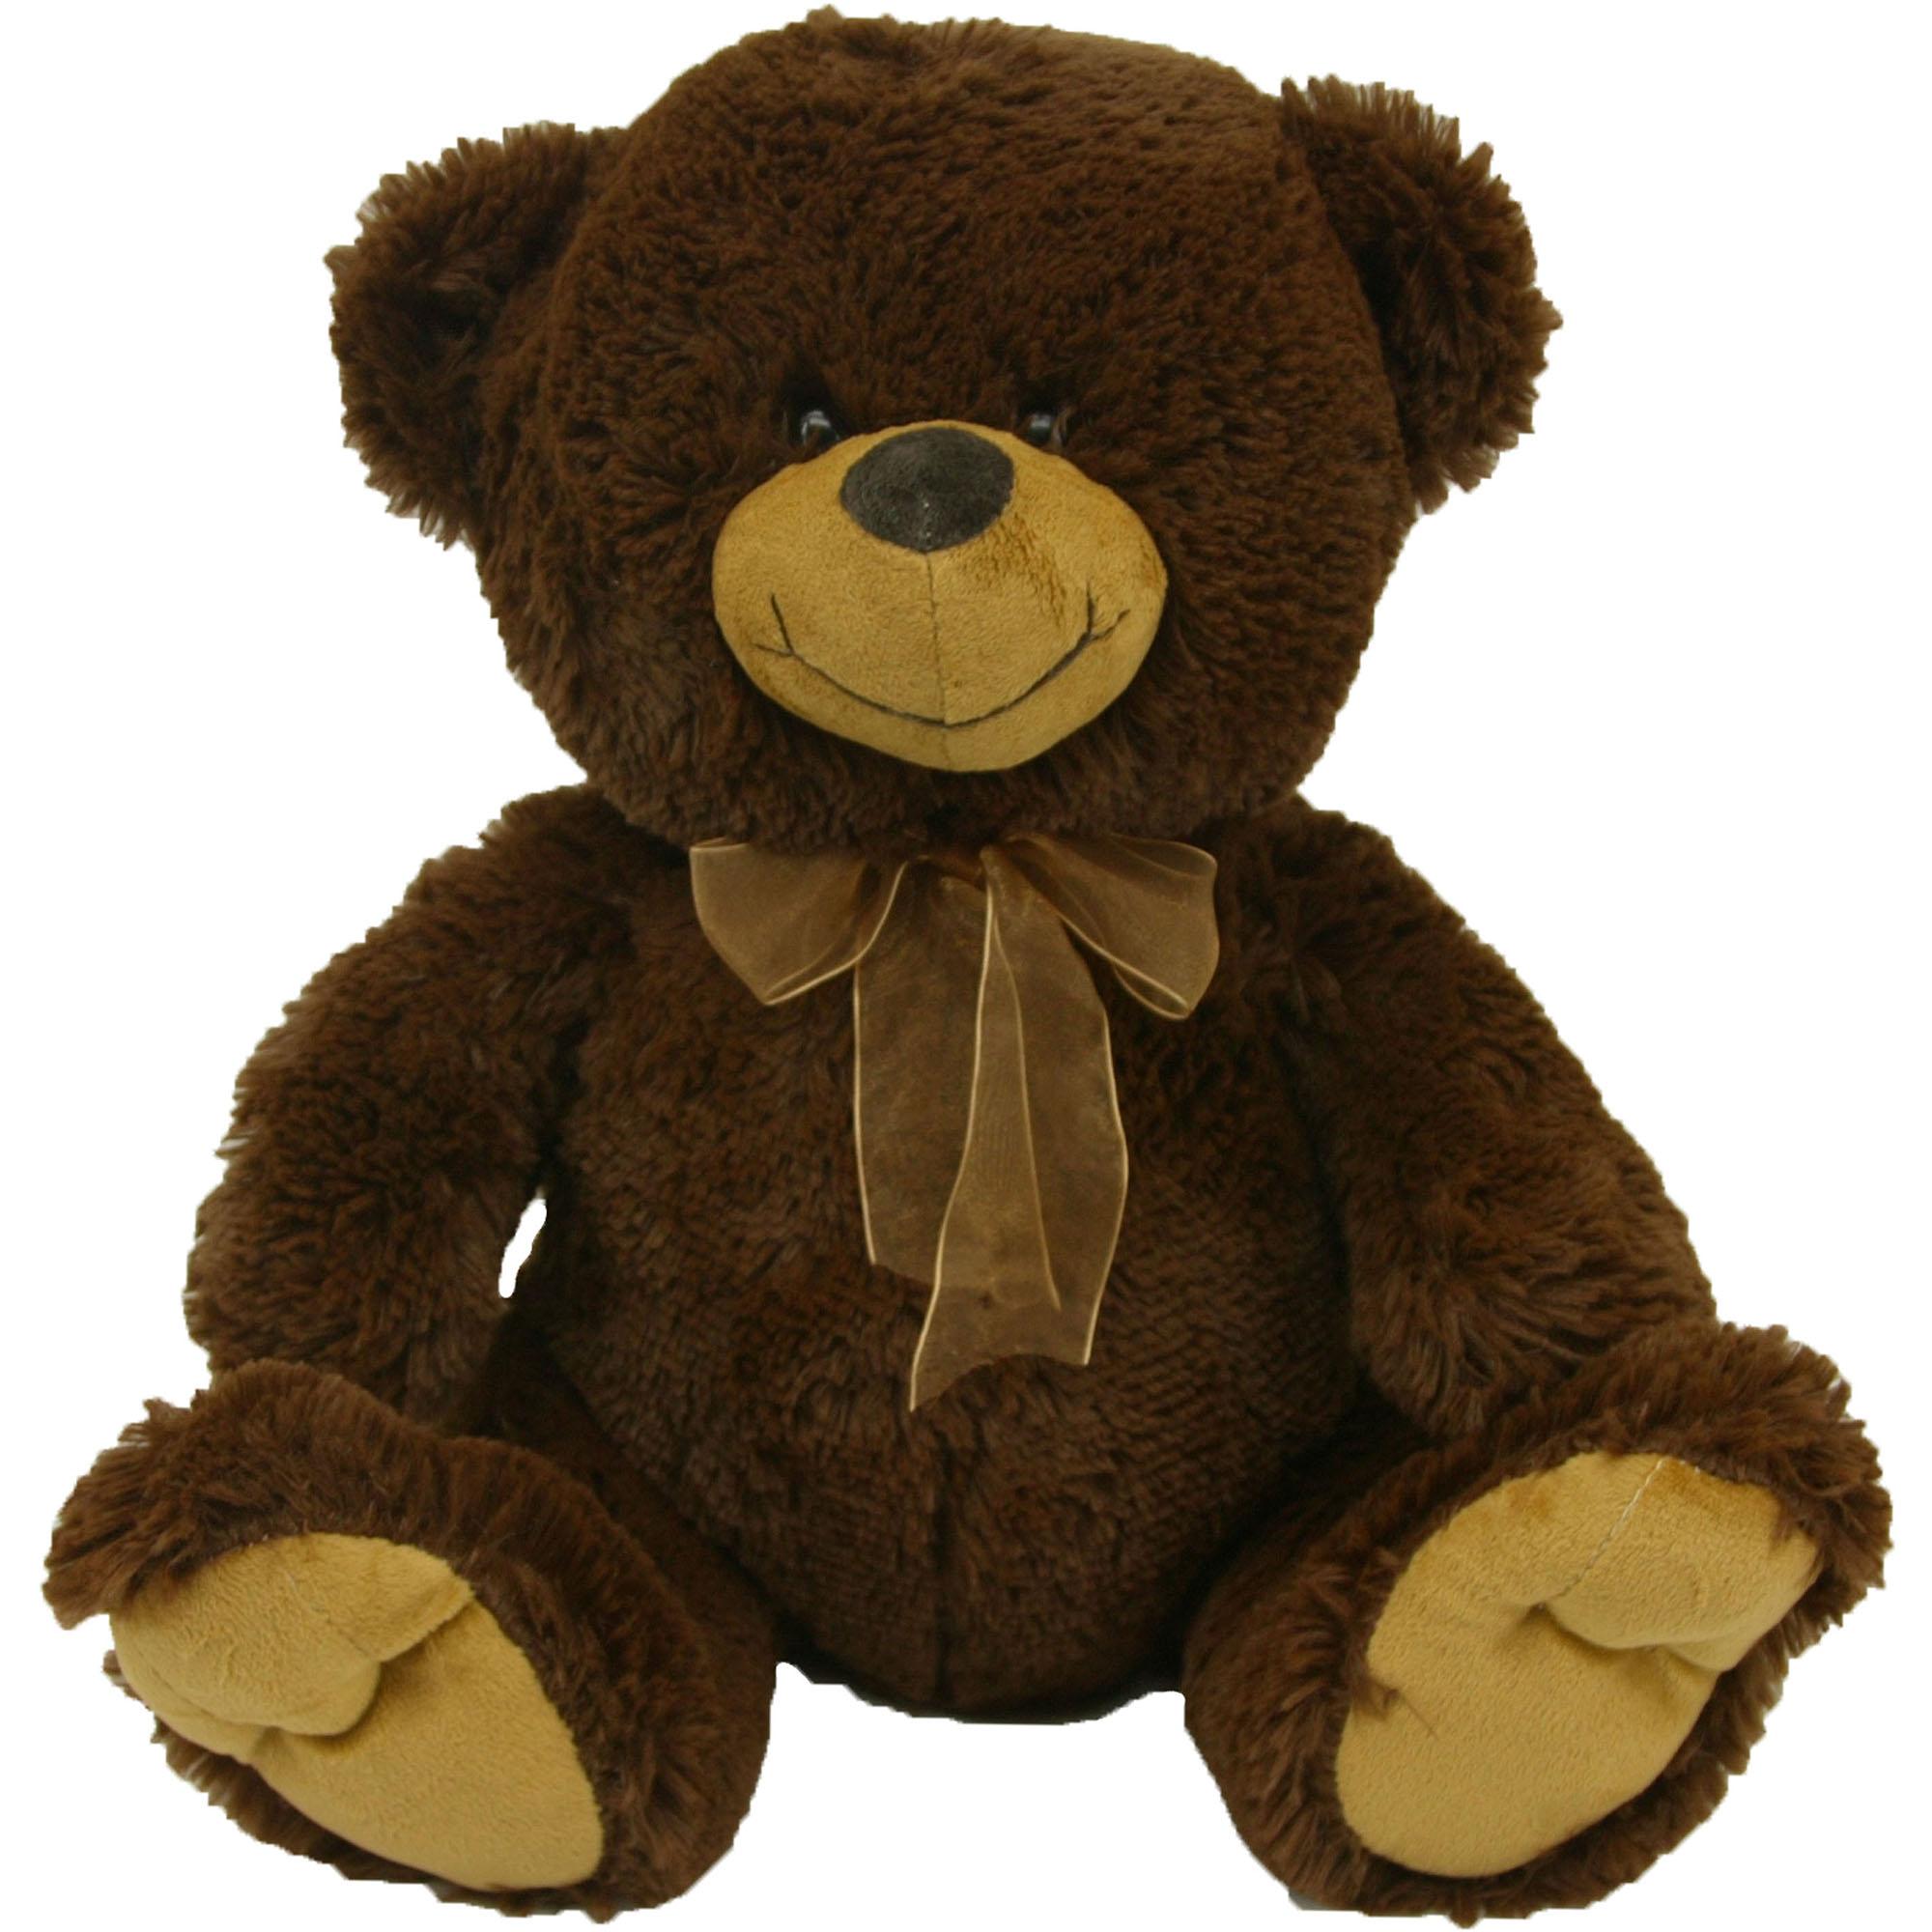 Big Plush 5 Foot Giant Teddy Bear 60 Inches Soft Cinnamon Brown ...